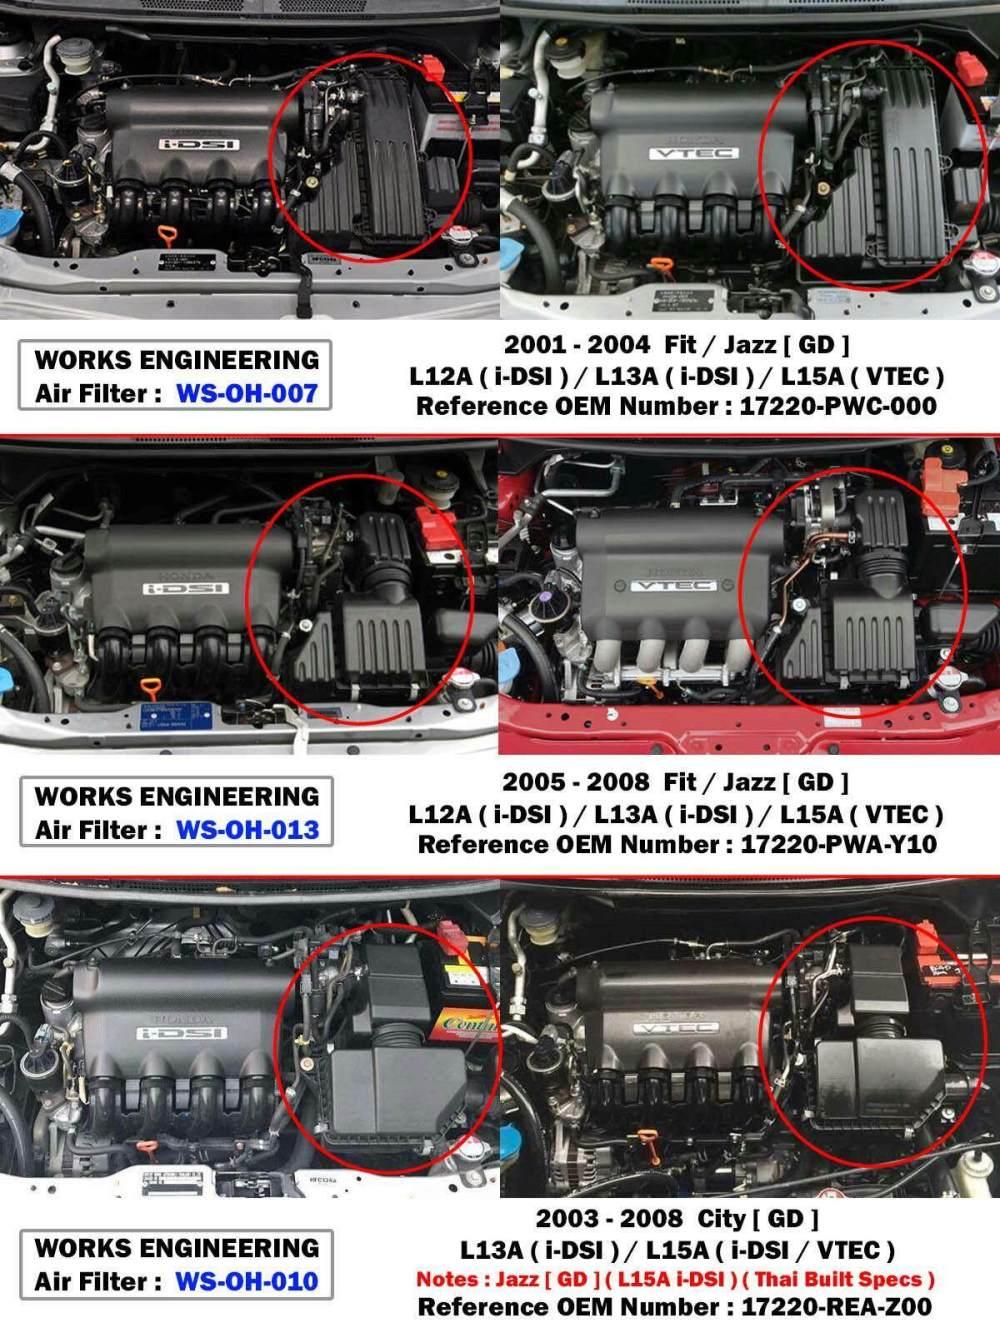 medium resolution of works high flow air filter for honda jazz fit gd1 gd3 gd5 1 2l 1 3l 1 5l 2005 08